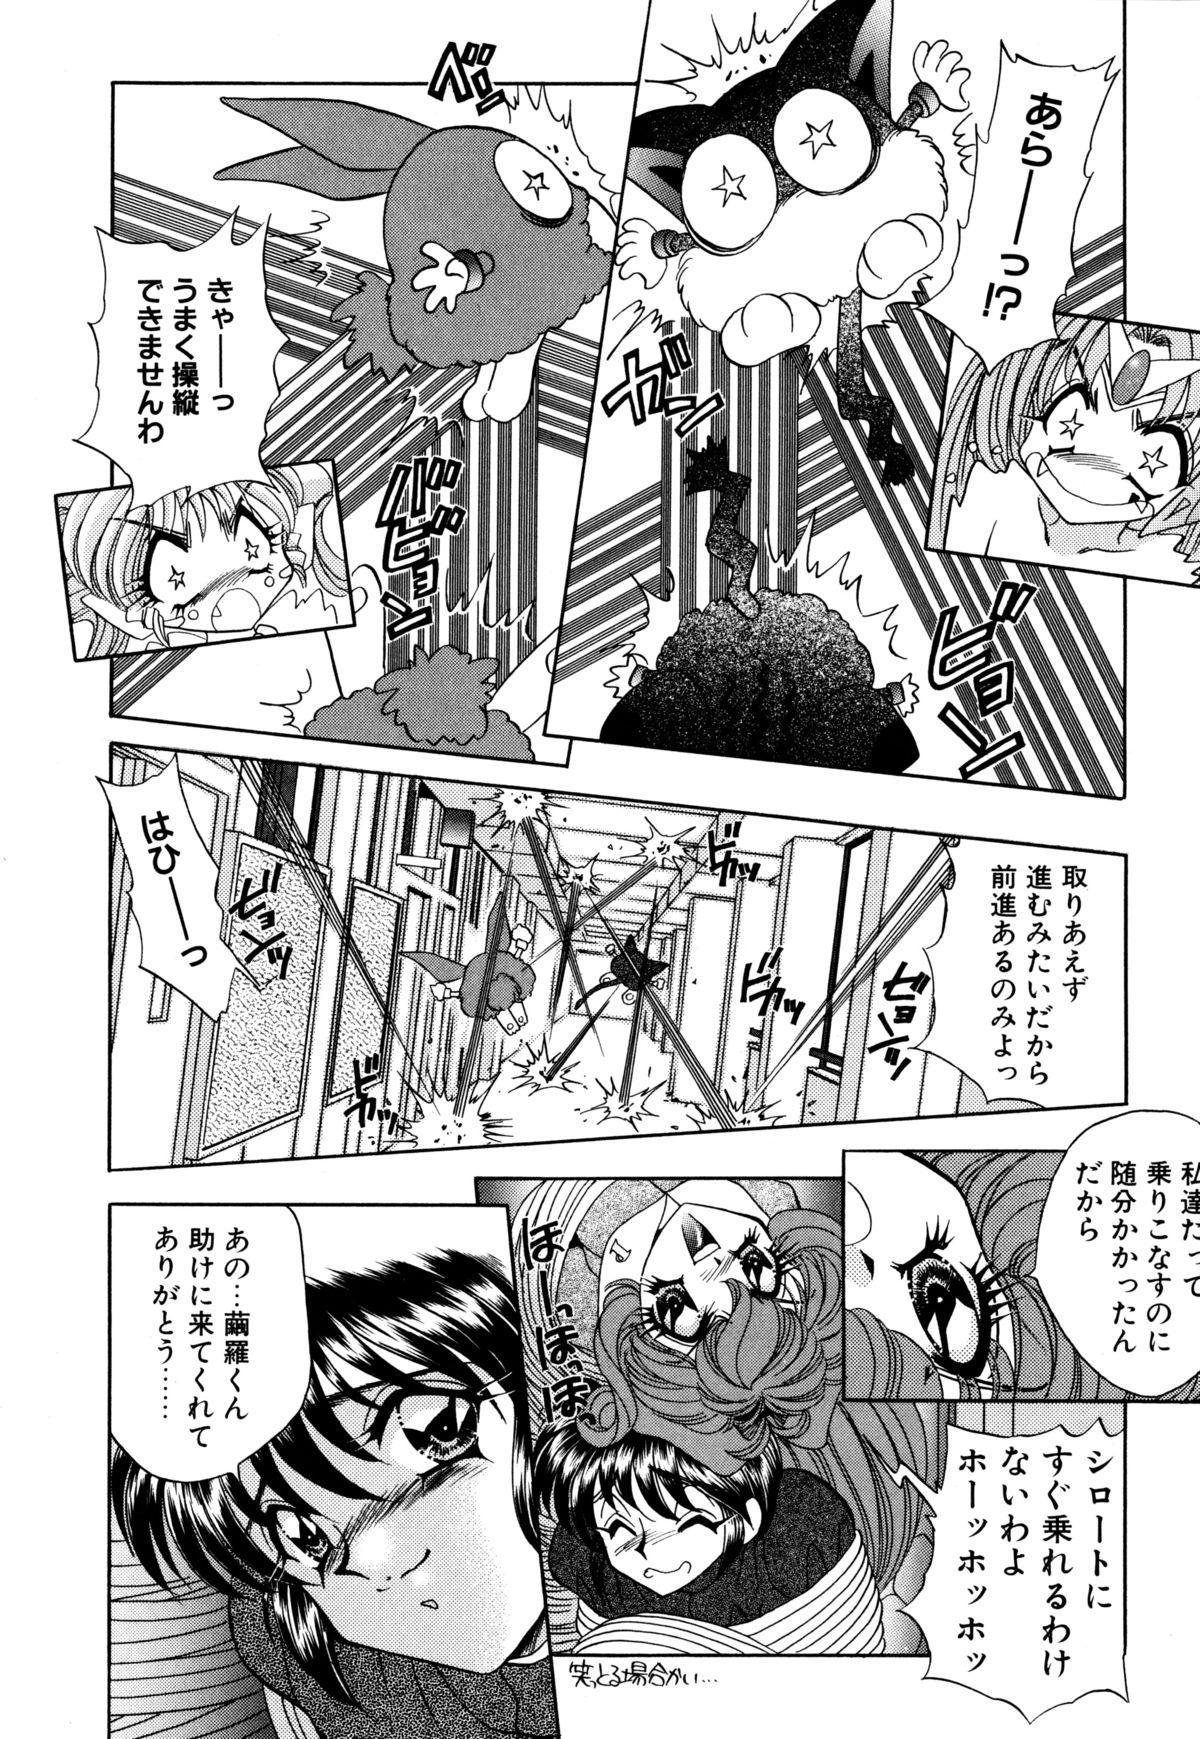 Kigurumi Sentai Quiltian 192